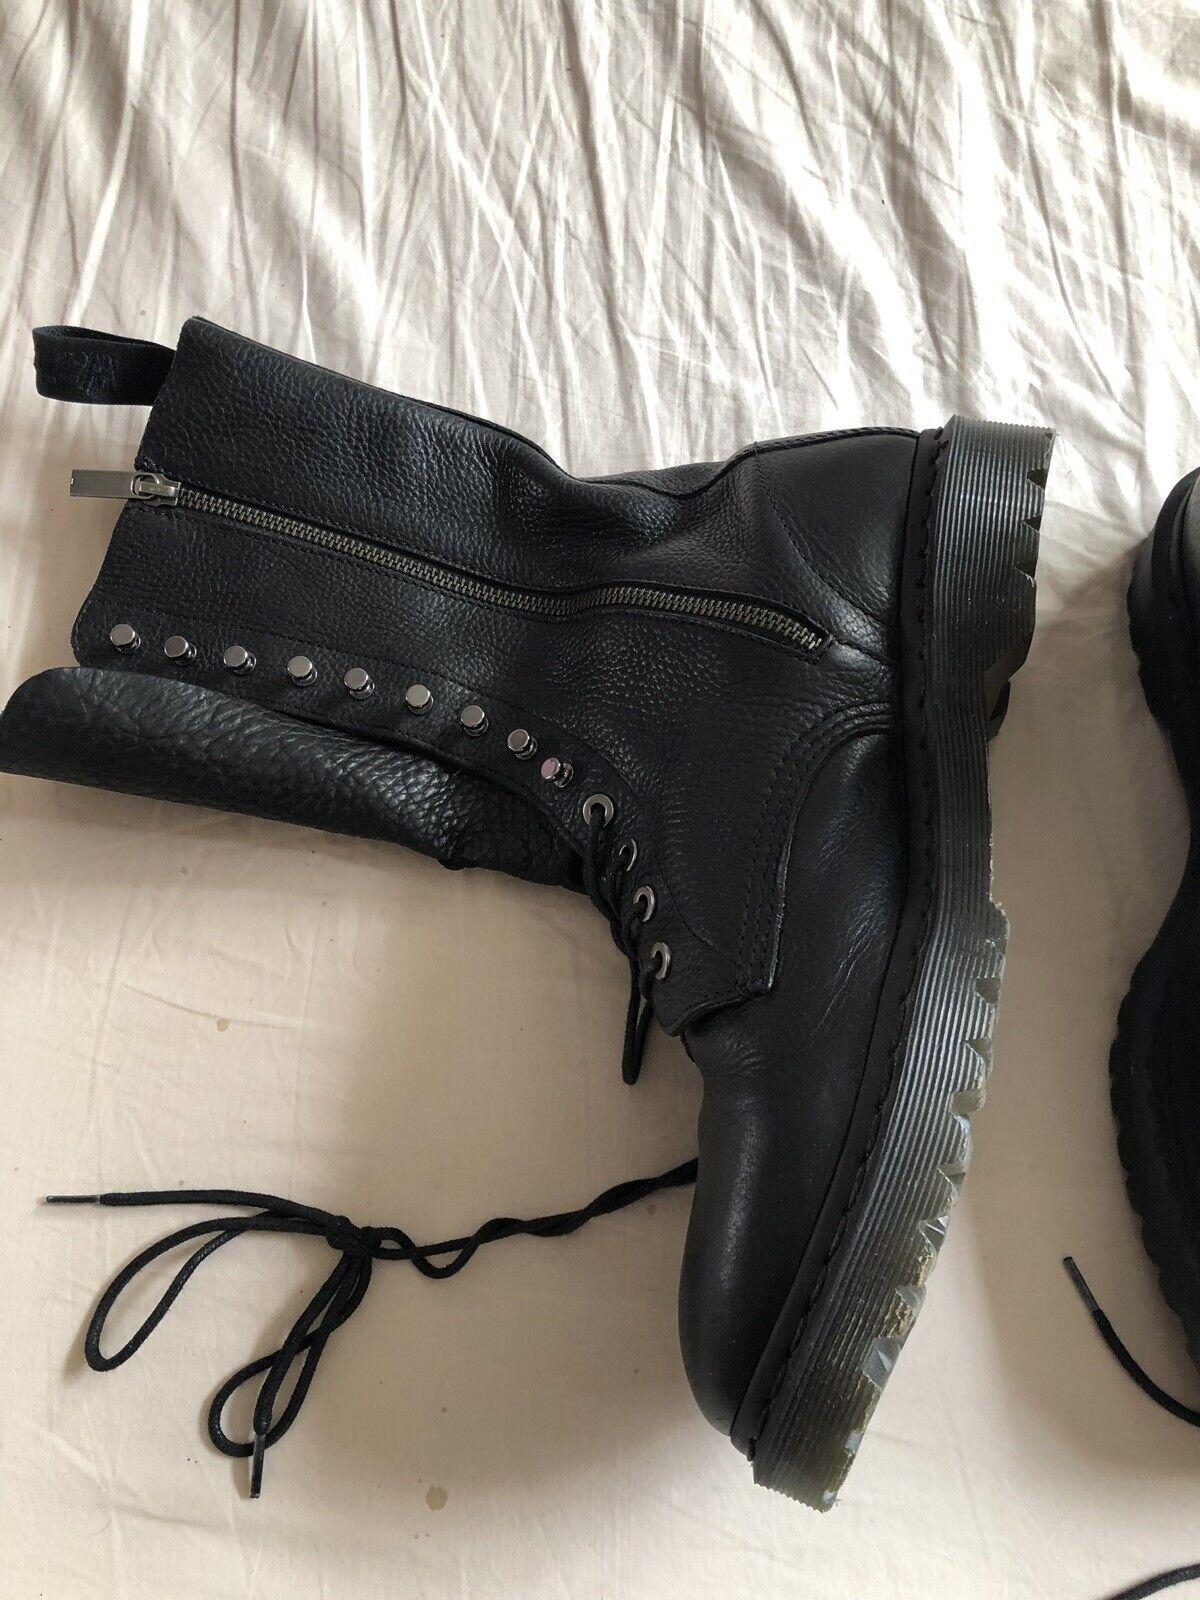 Dr Martens Boots size UK9